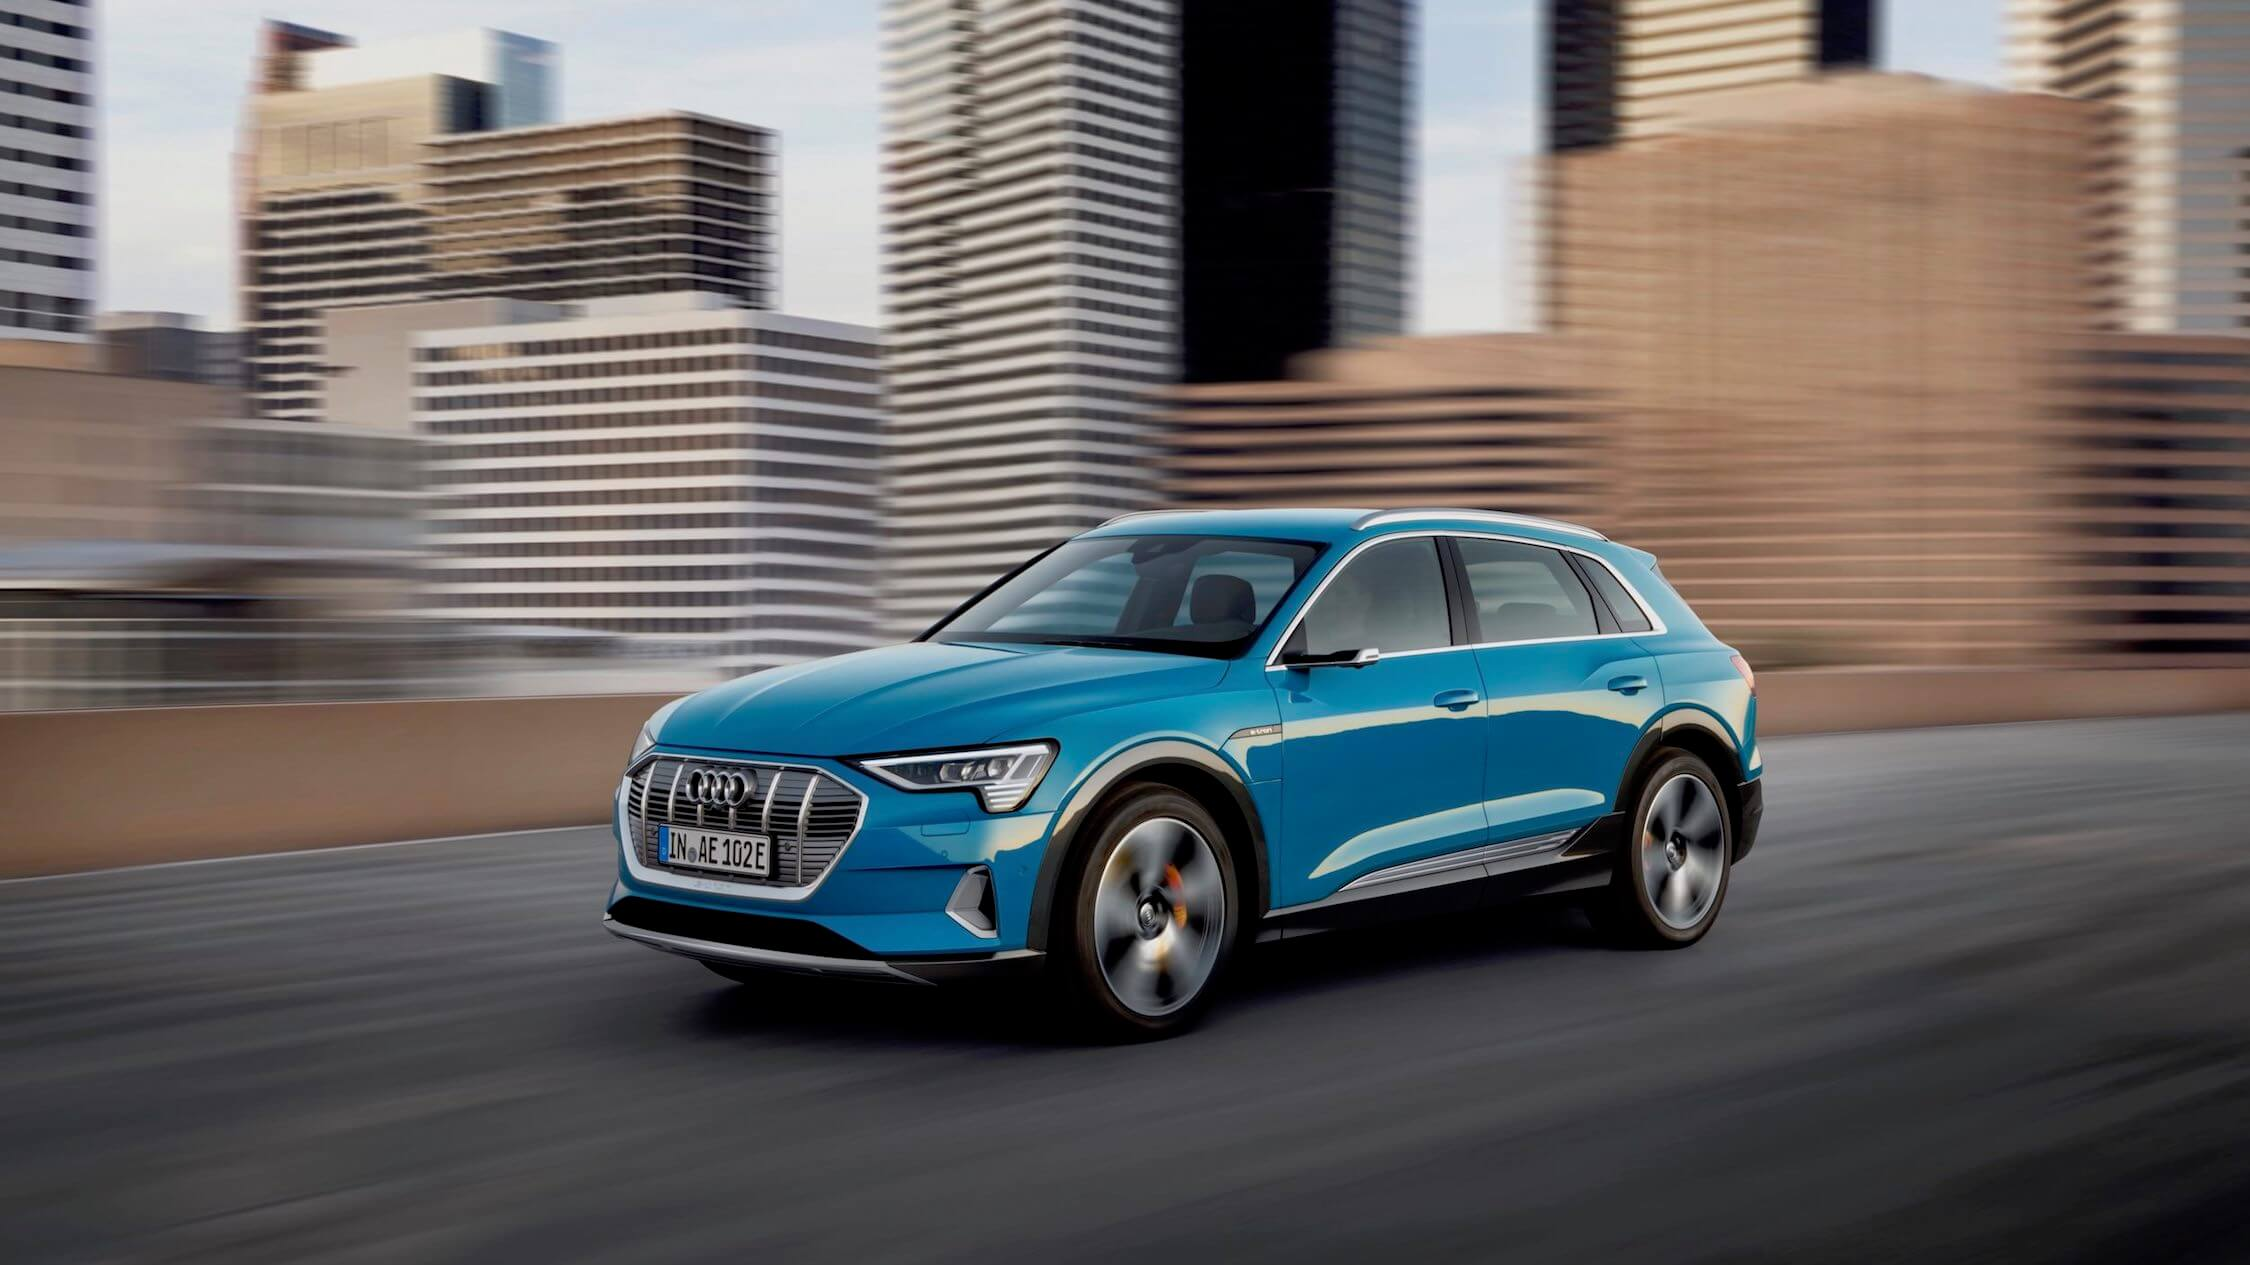 Audi-e-tron-electric-car